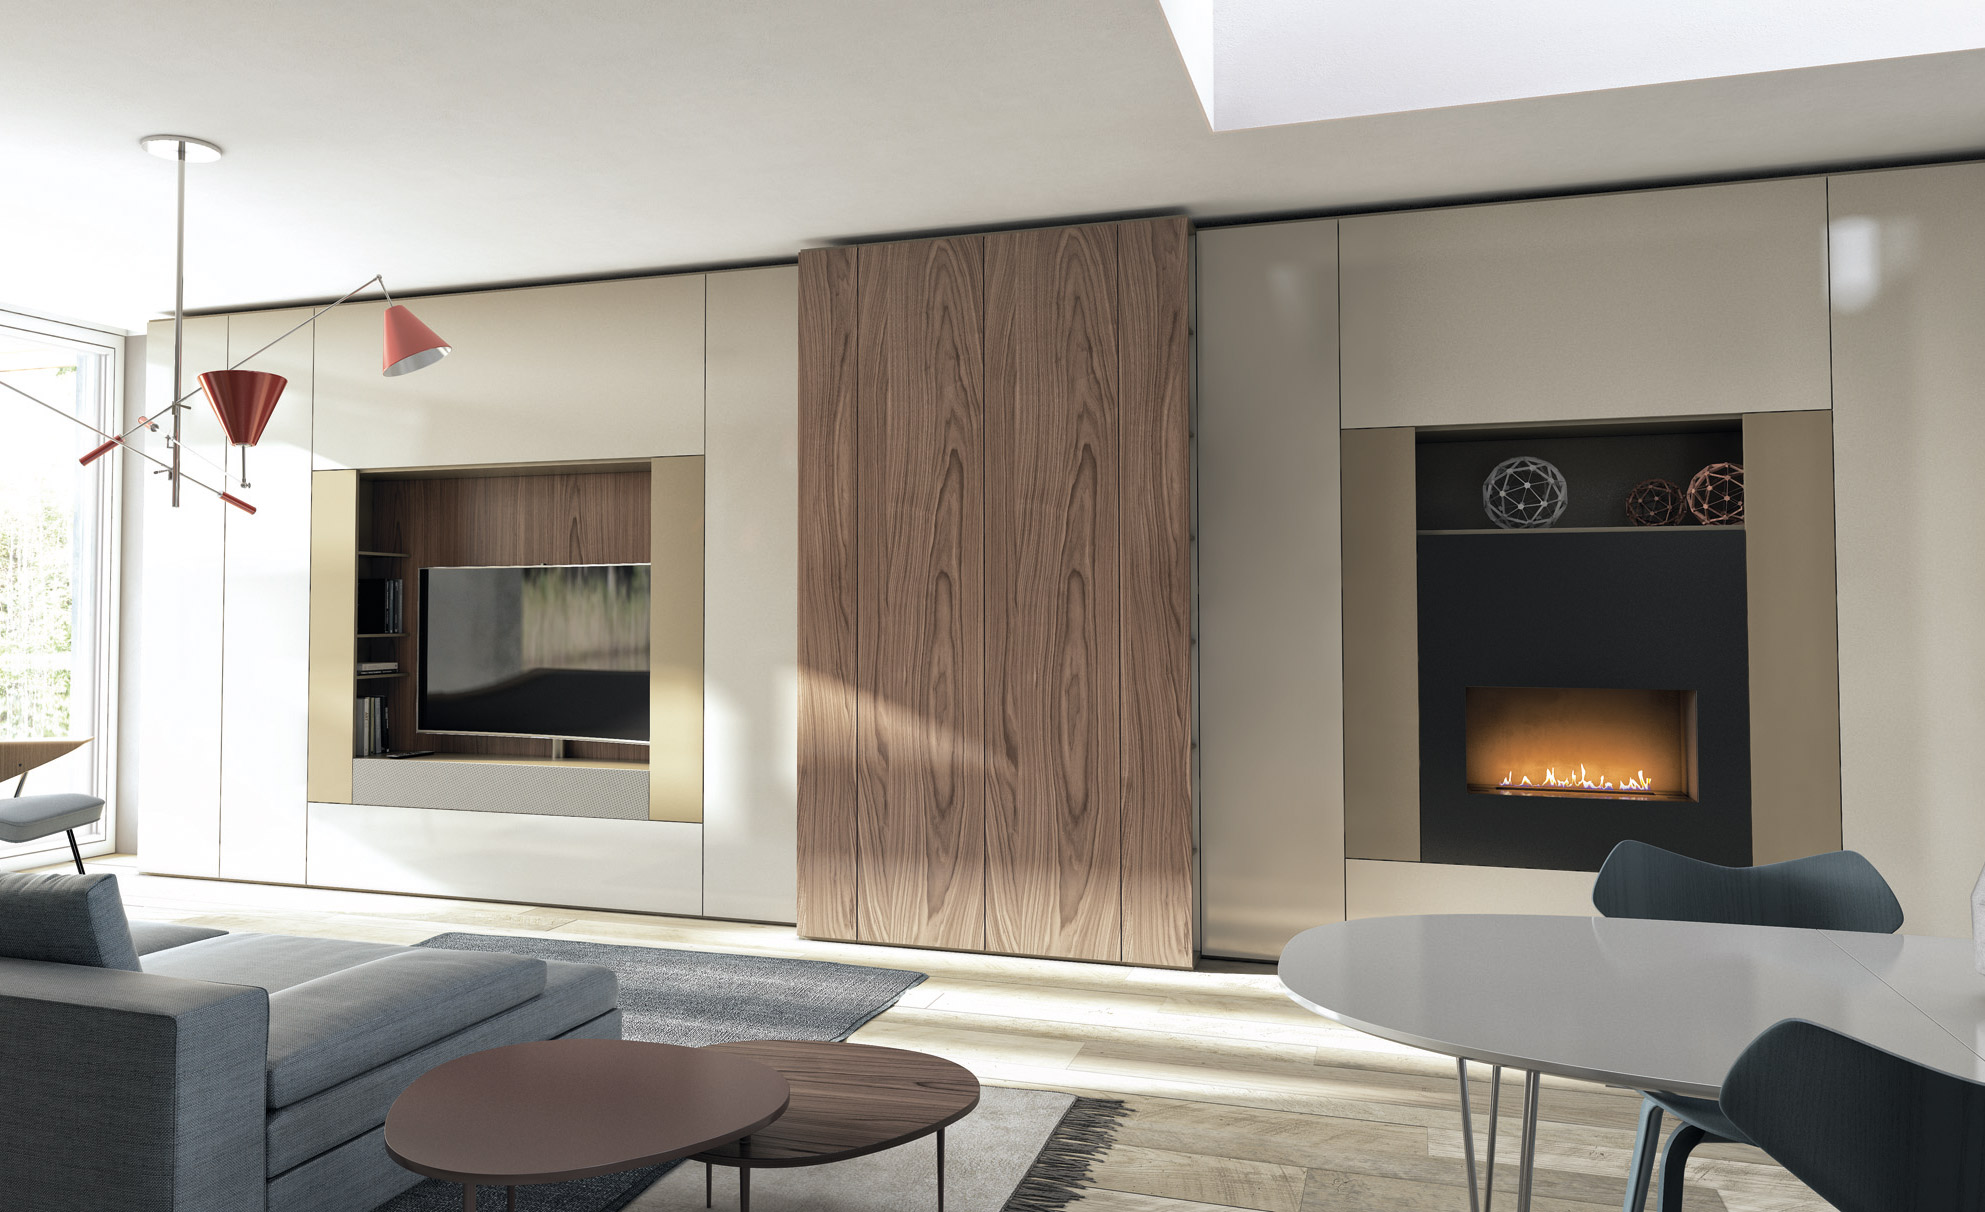 Ad novoli architettura d 39 interni home for Ad arredamenti novoli